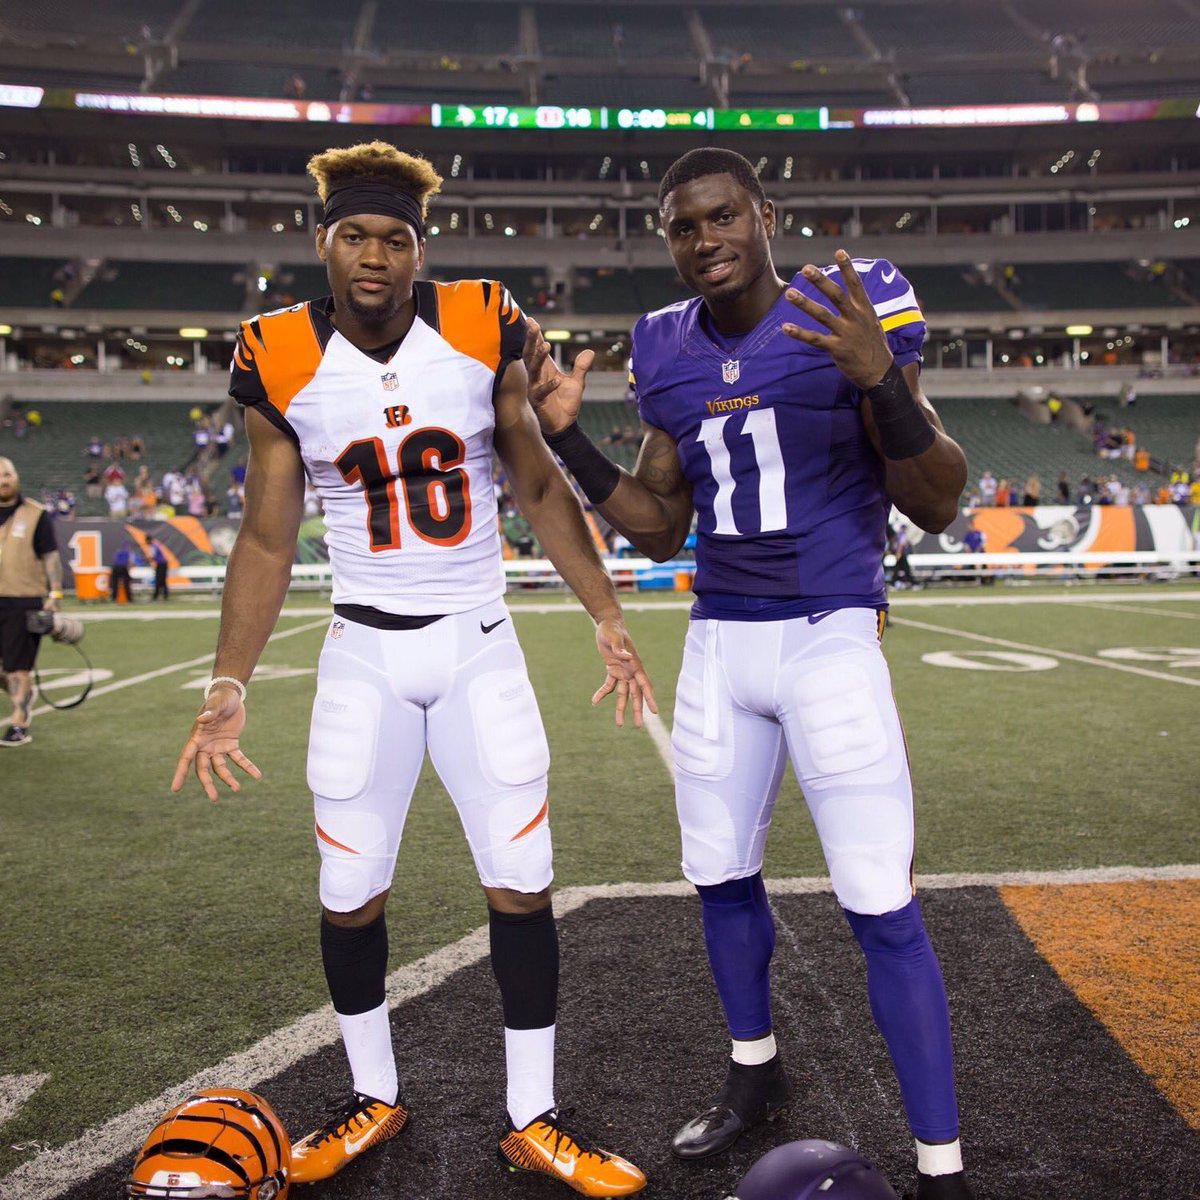 Two Legendary Rebels making their NFL debuts #TheNewWRU